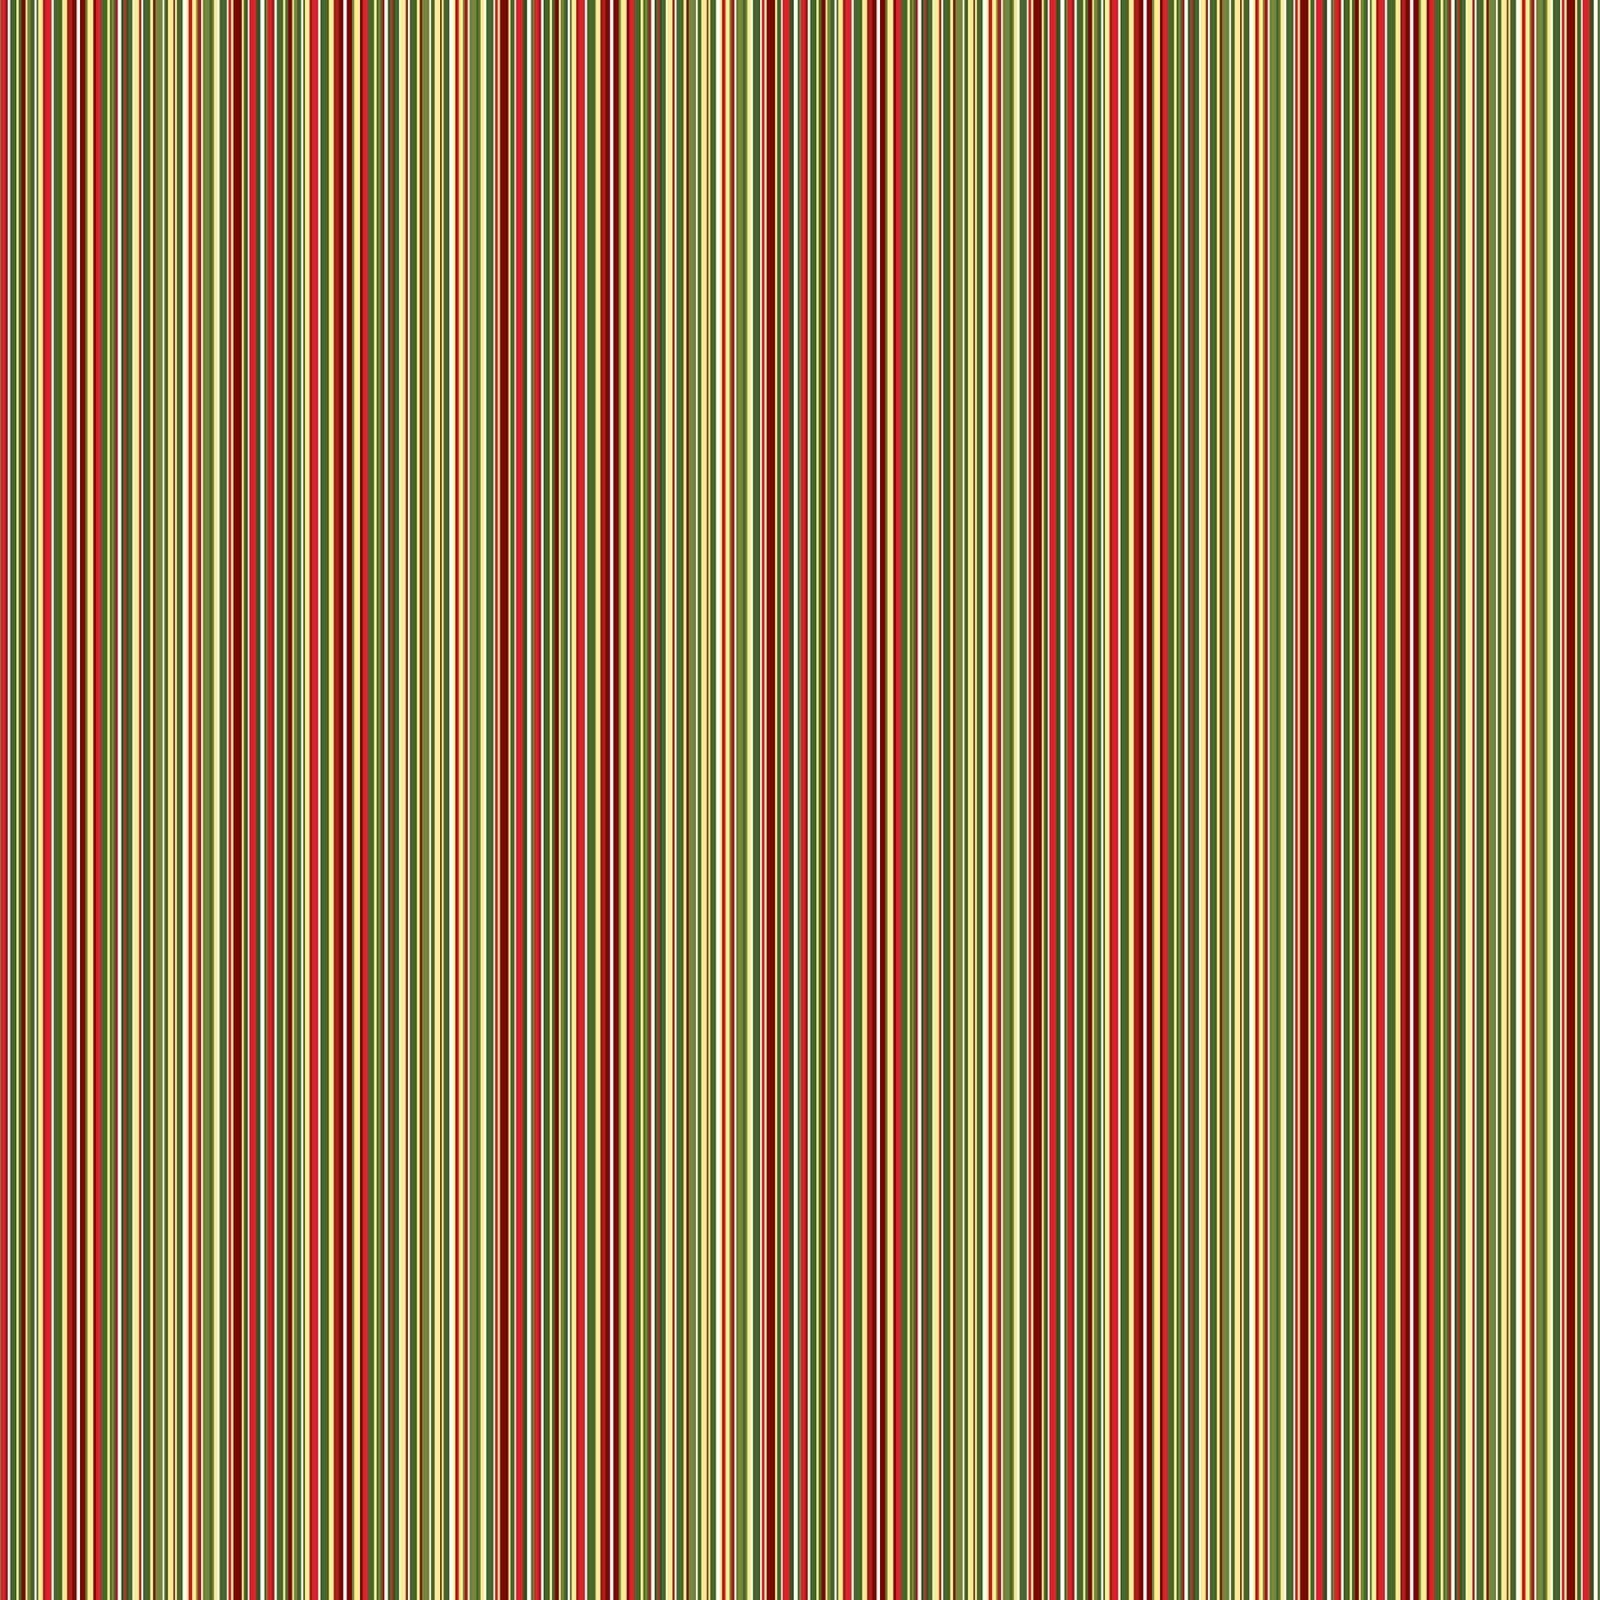 Briarwood Multi Stripe 23303 10